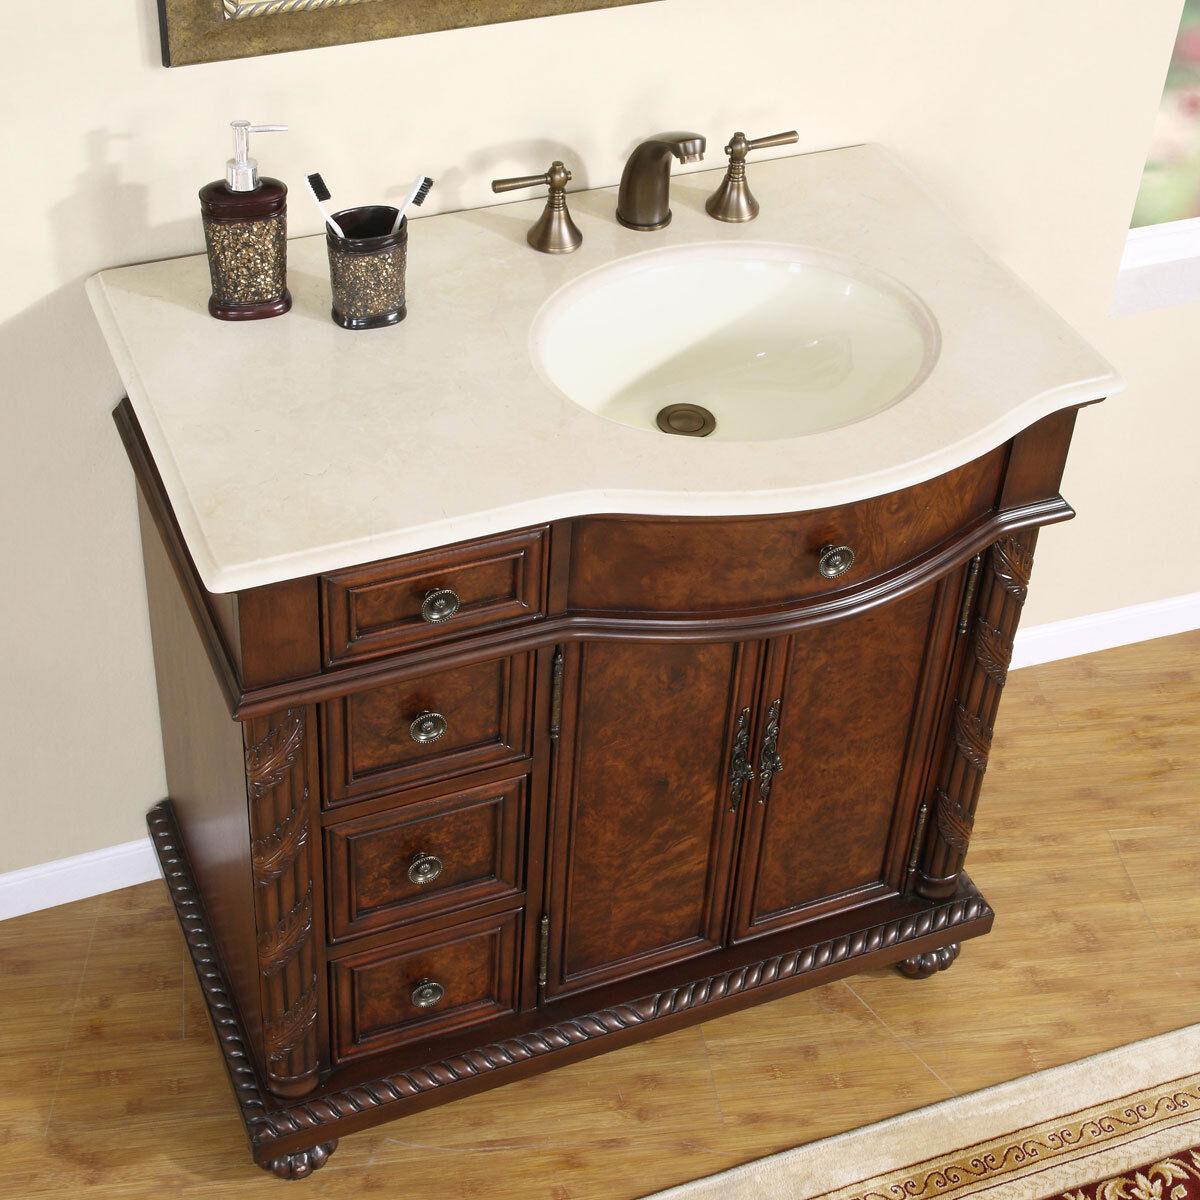 36 Marble Top Lavatory Bathroom Single Vanity Cabinet Off Center Sink 213cm R 609224899362 Ebay